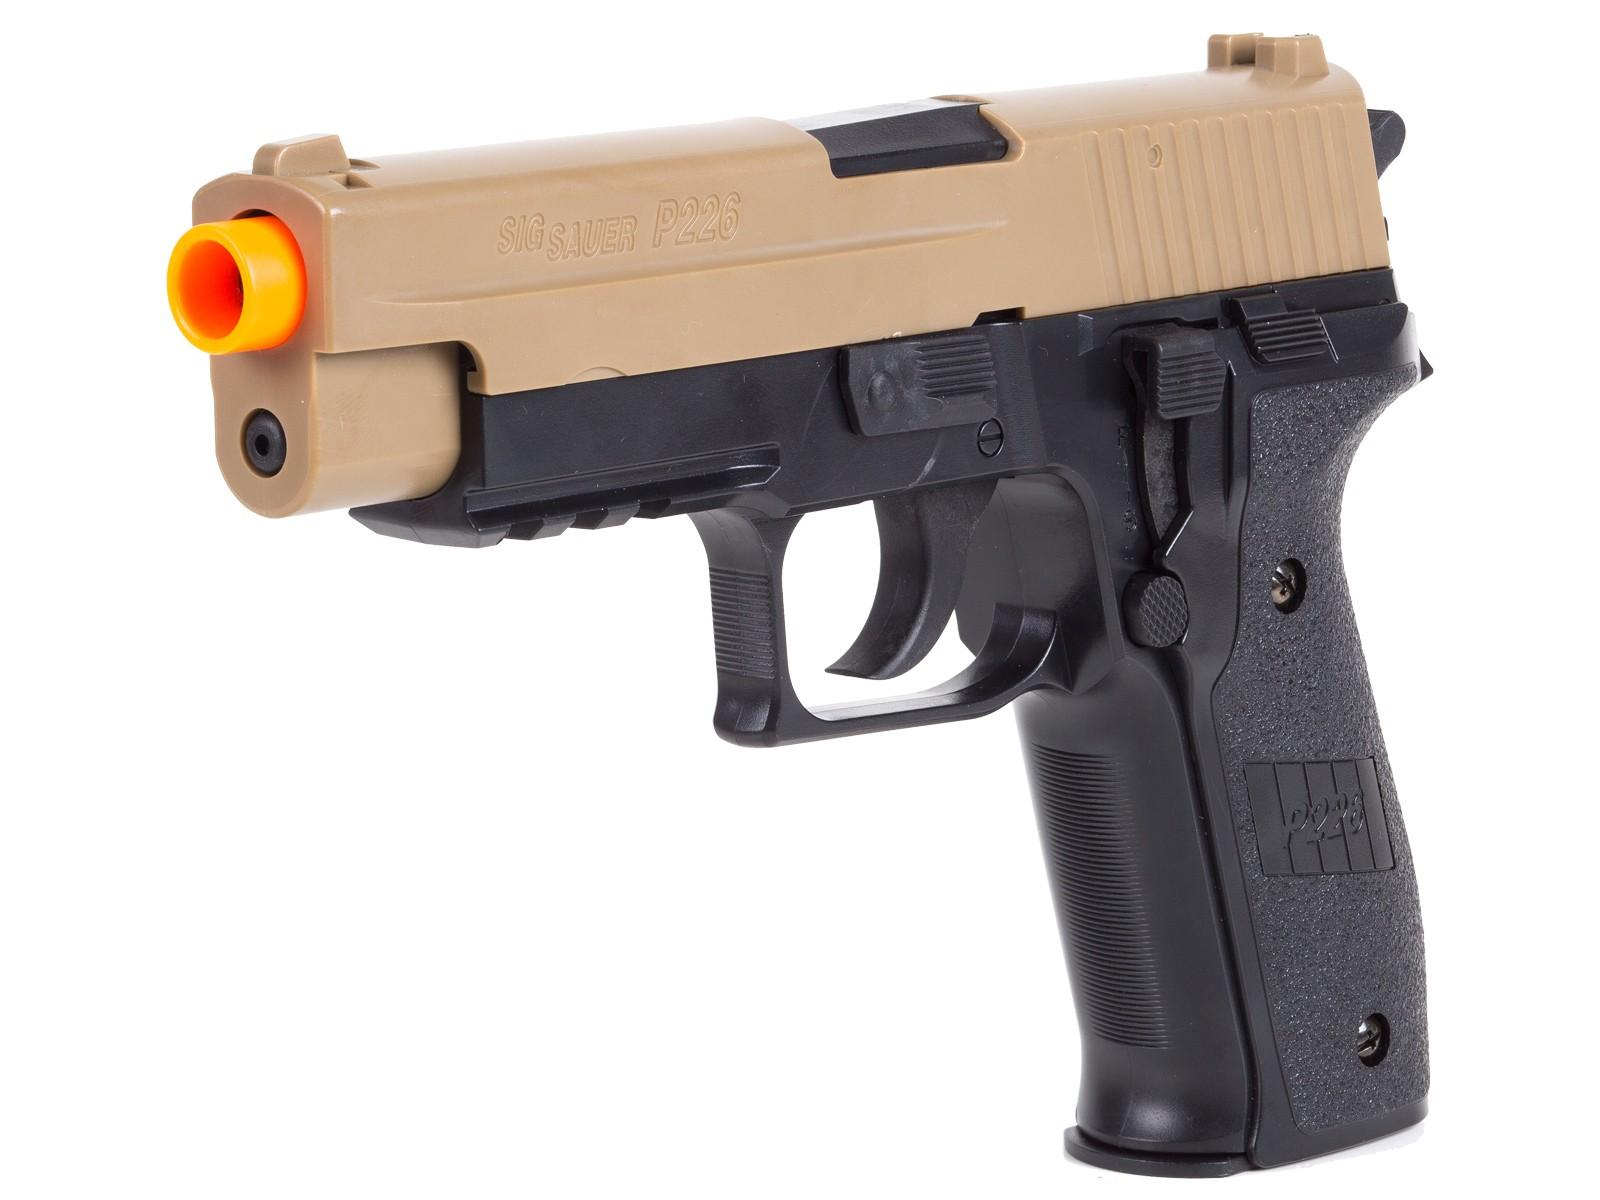 SIG_Sauer_P226_Airsoft_Pistol_BlackTan_6mm